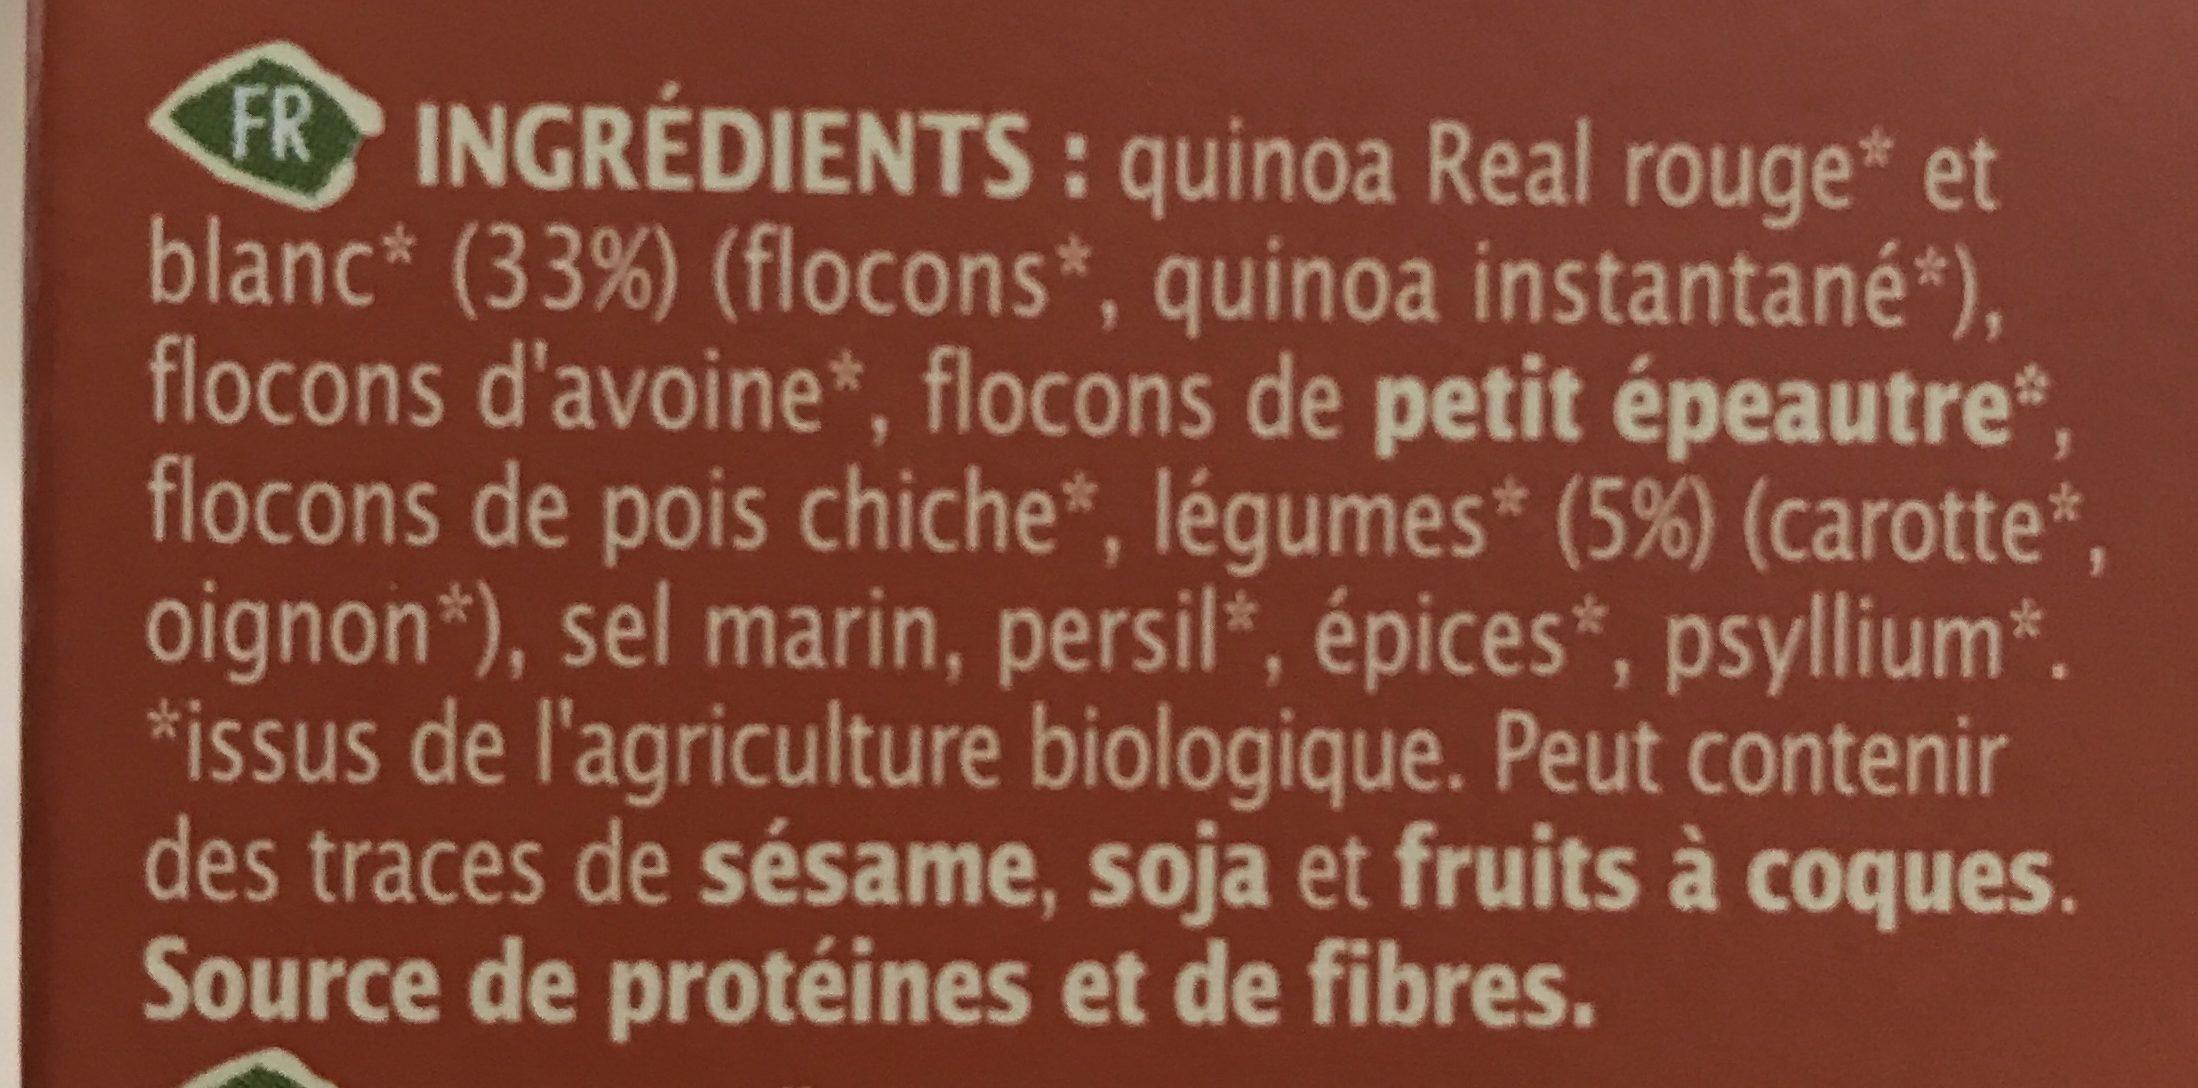 Mix' galette veggie burger - Ingrédients - fr